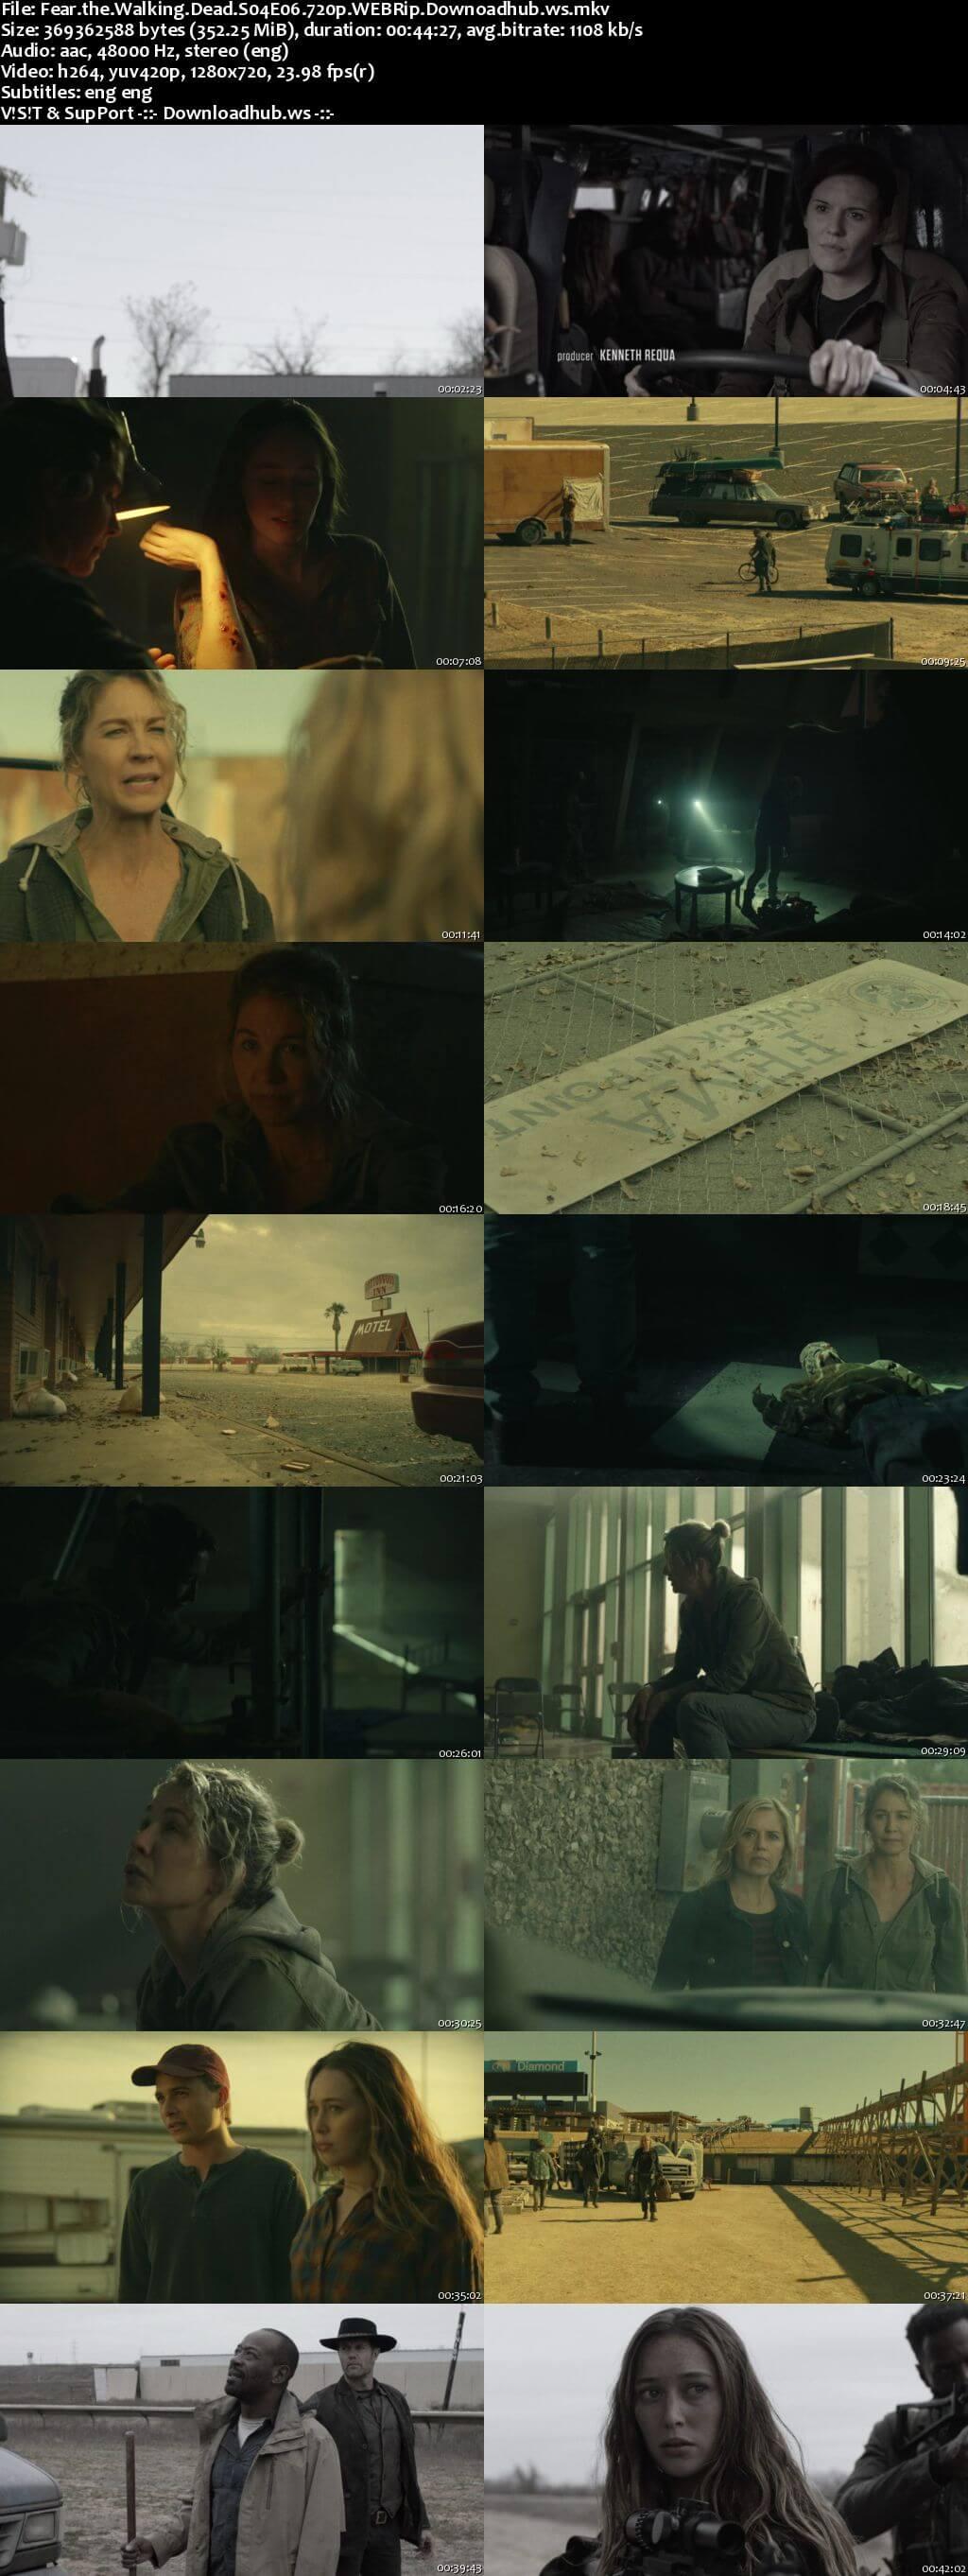 Fear the Walking Dead S04E06 350MB WEBRip 720p x264 ESubs